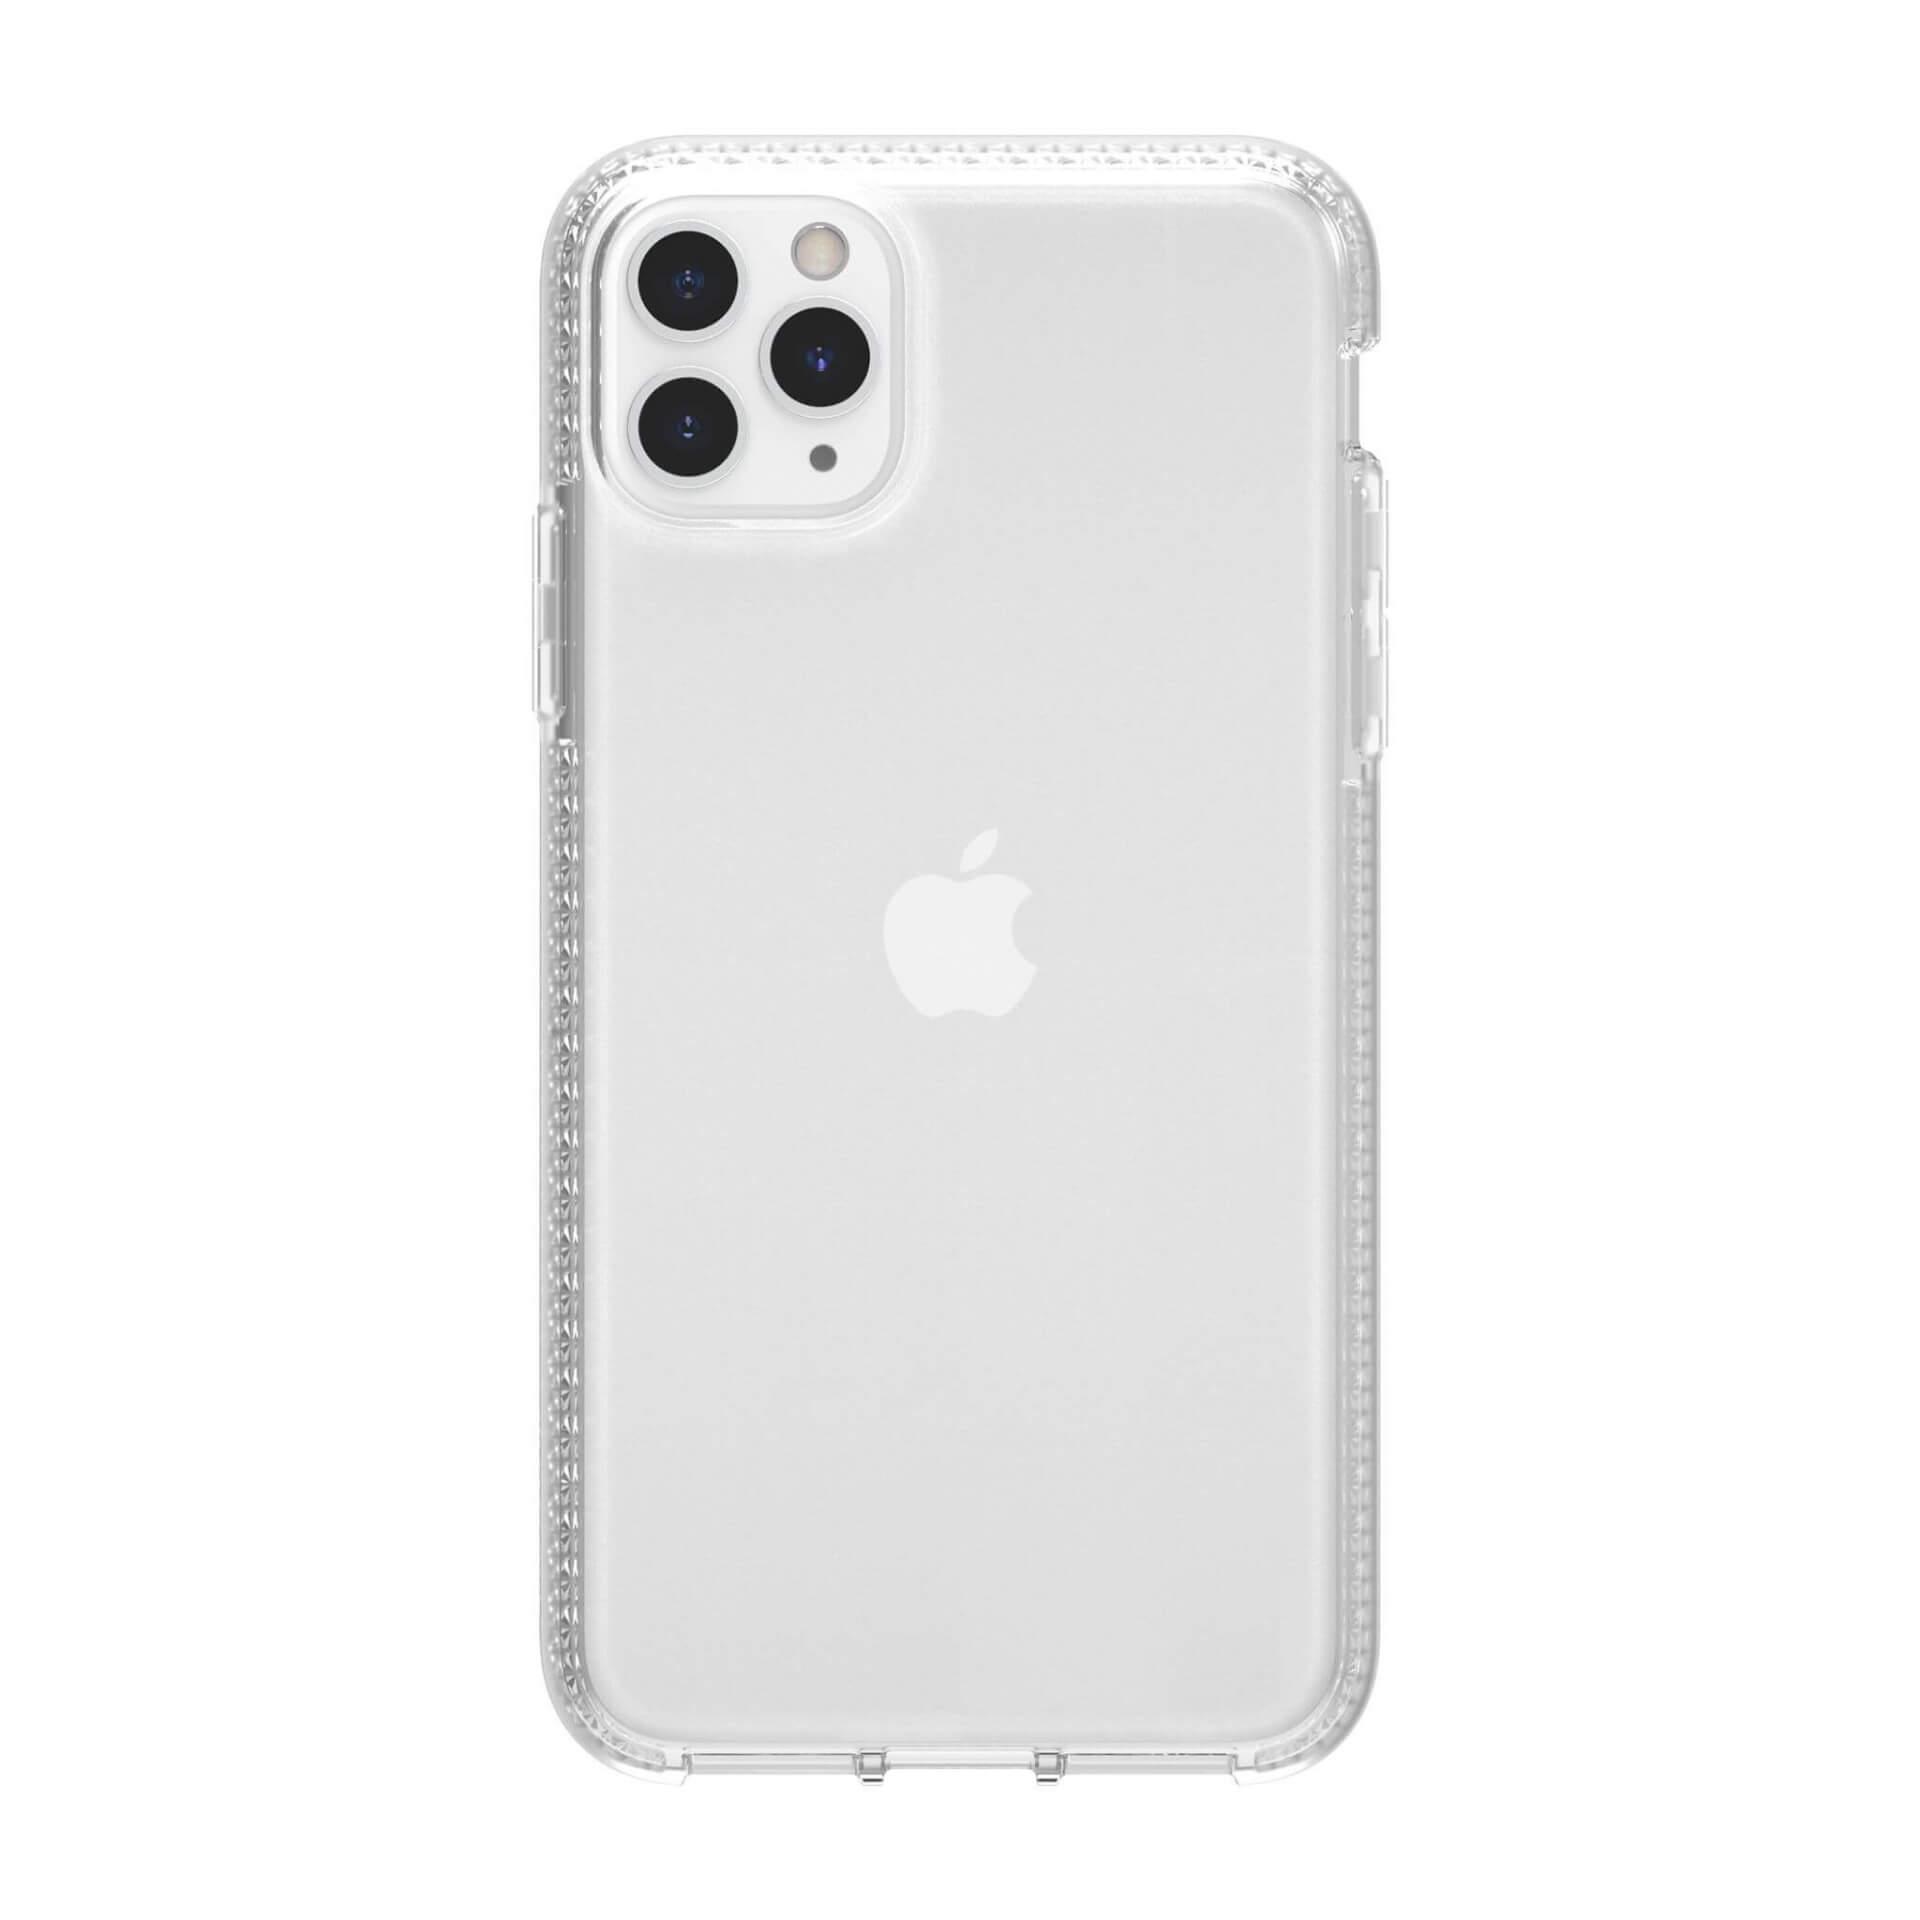 Griffin Survivor Clear Case — хибриден удароустойчив кейс за iPhone 11 Pro (прозрачен) - 1